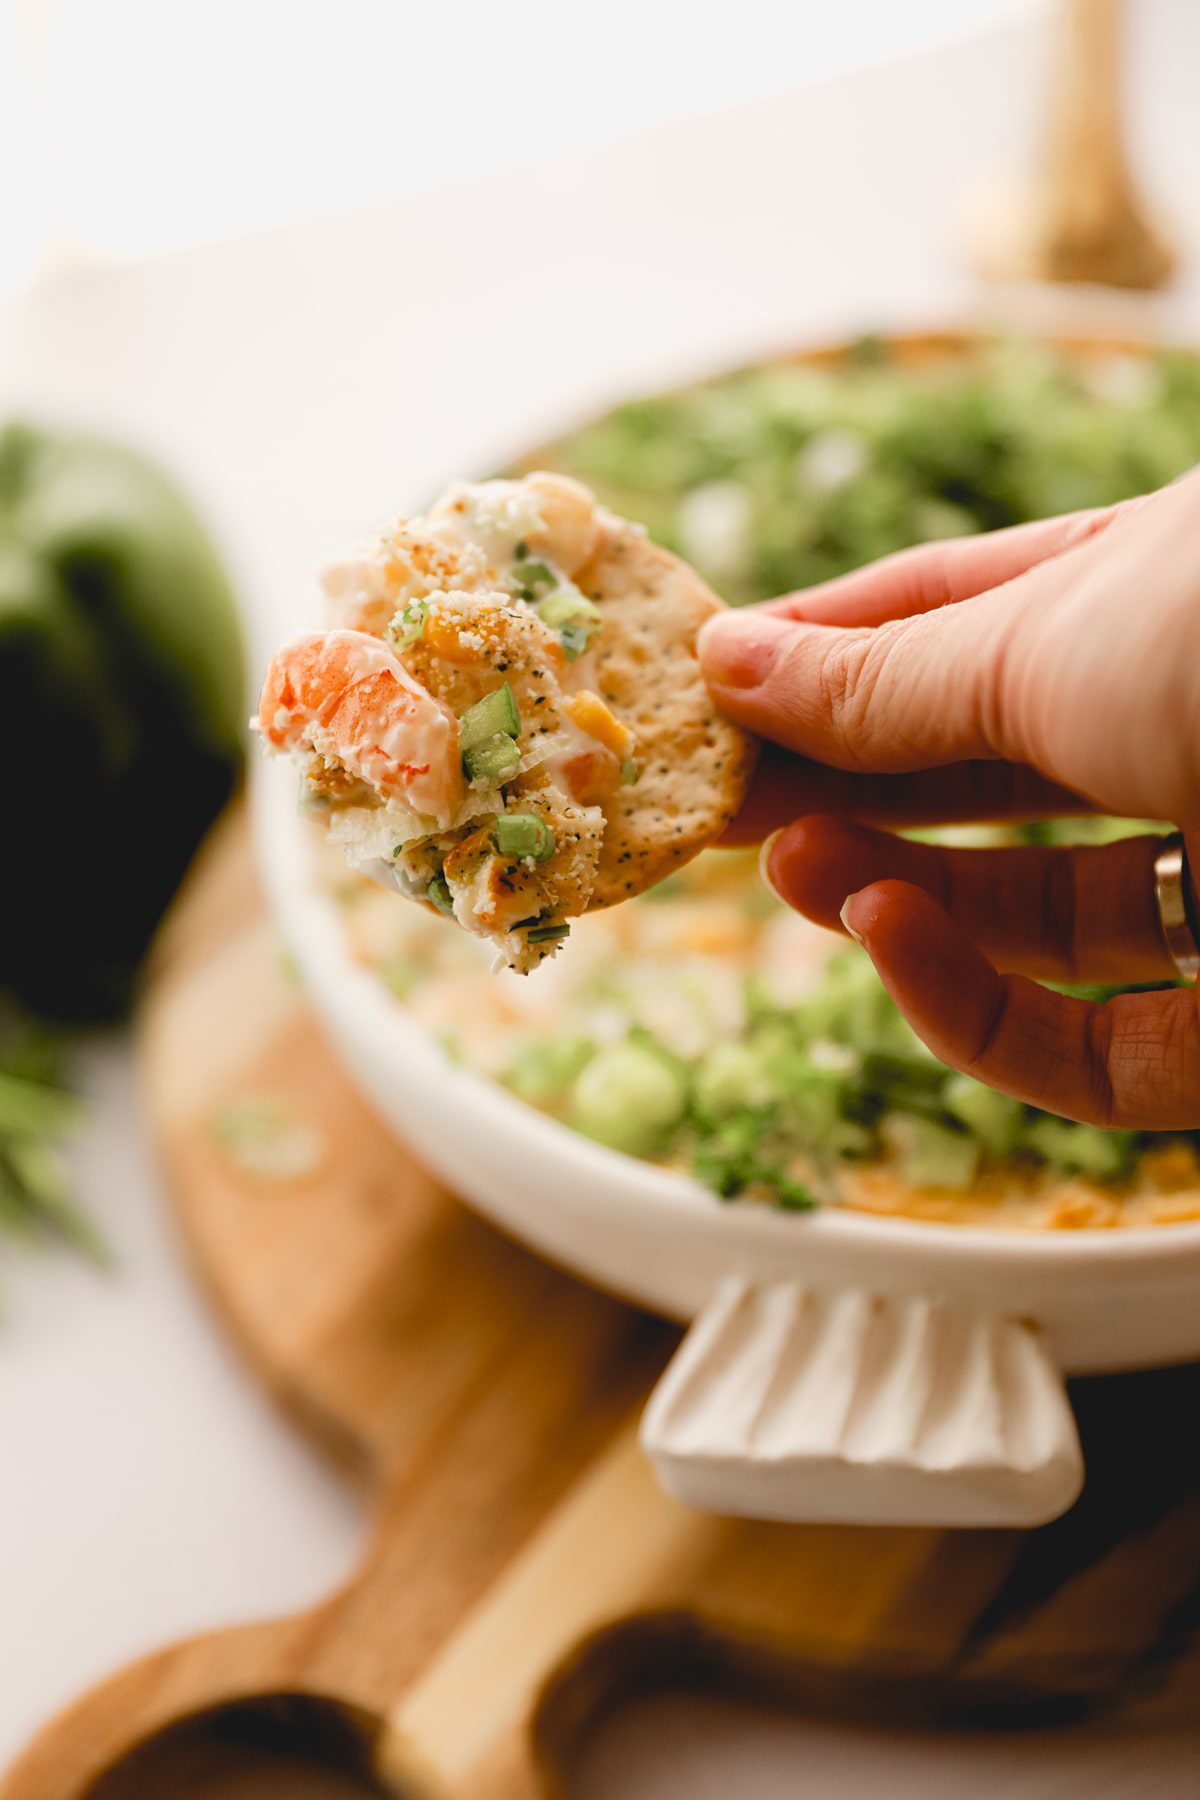 cracker scooped in creamy shrimp dip.